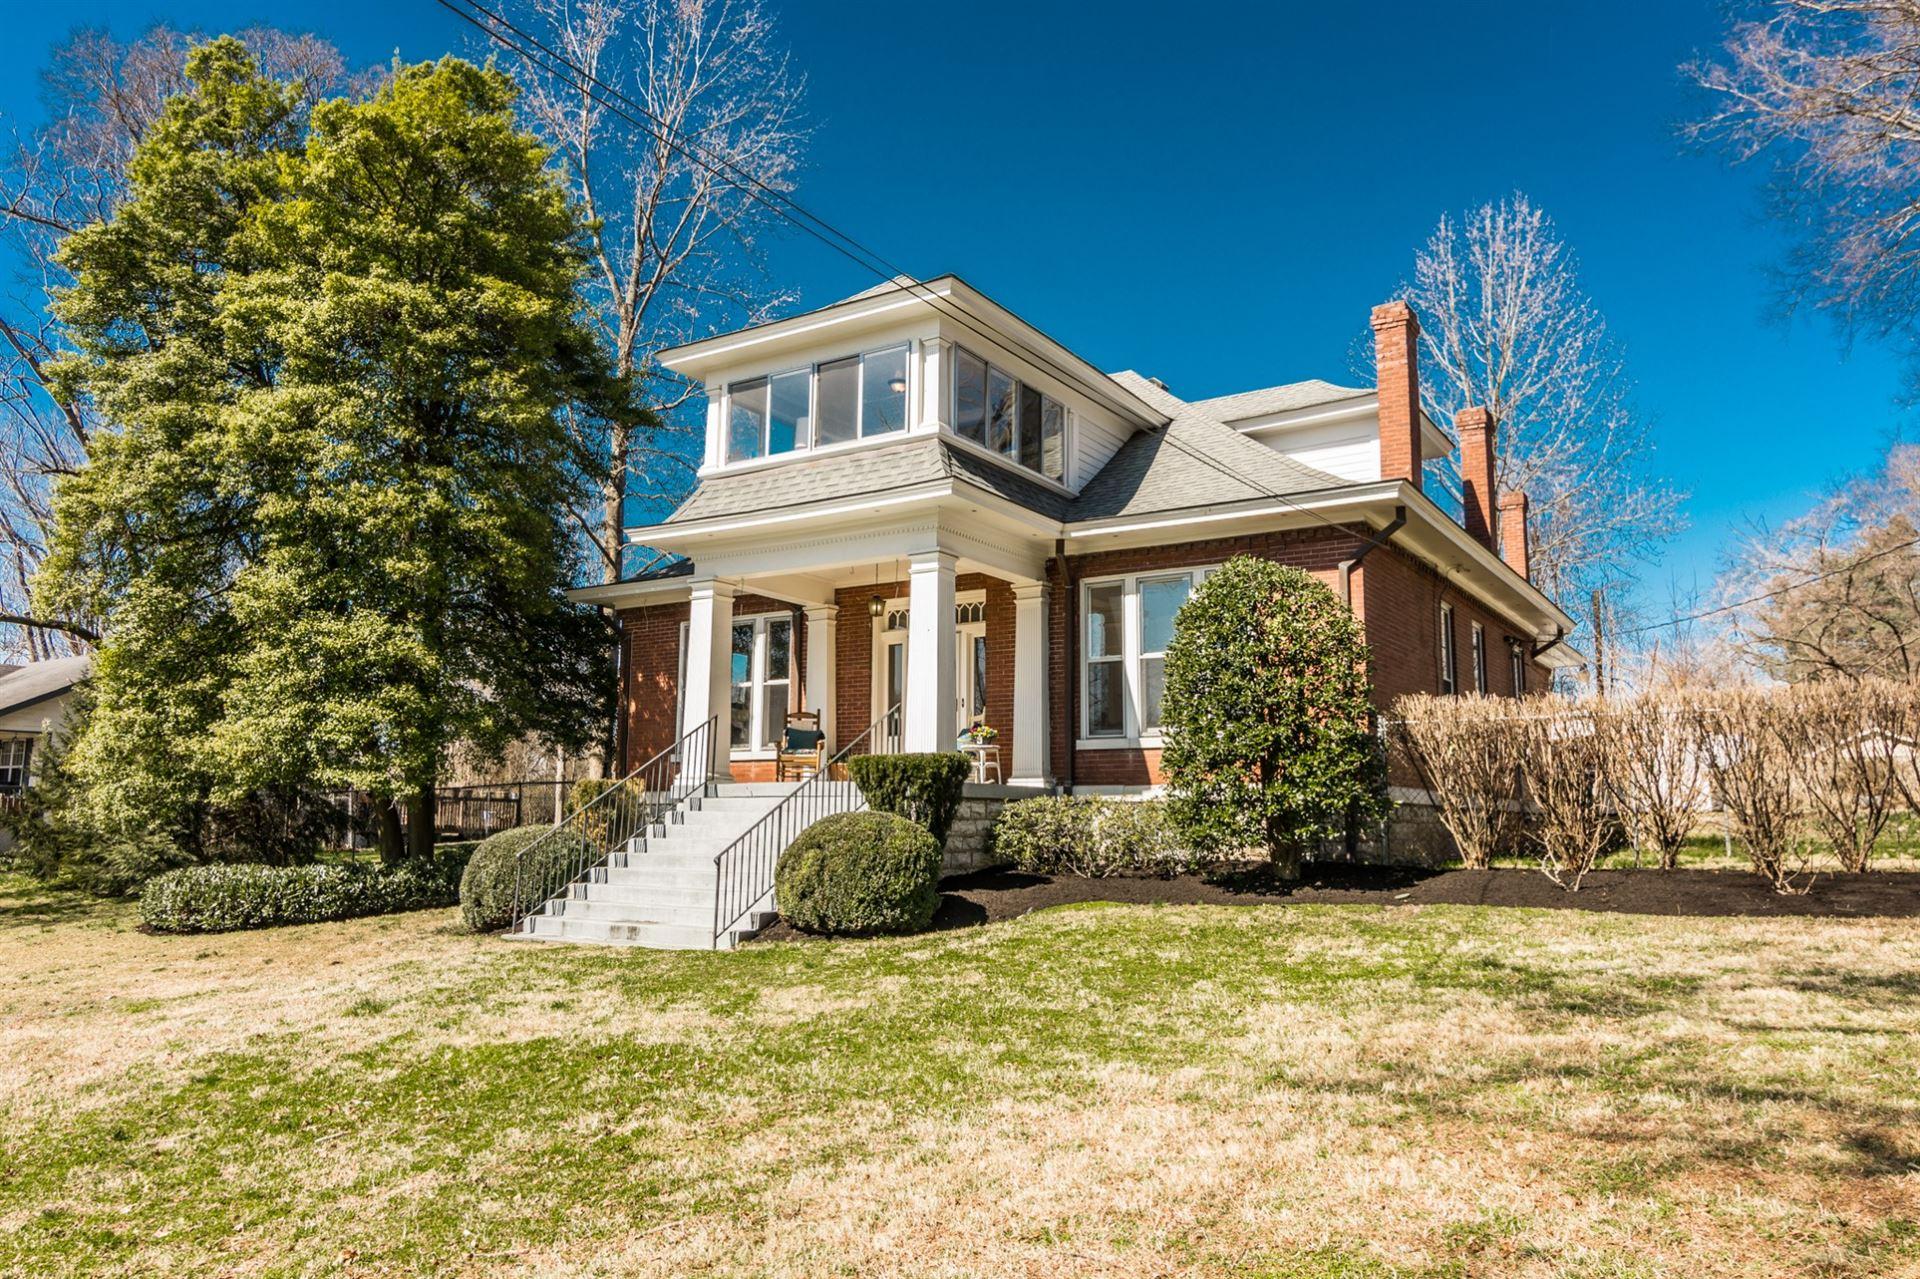 1717 Greenwood Ave, Nashville, TN 37206 - MLS#: 2233604